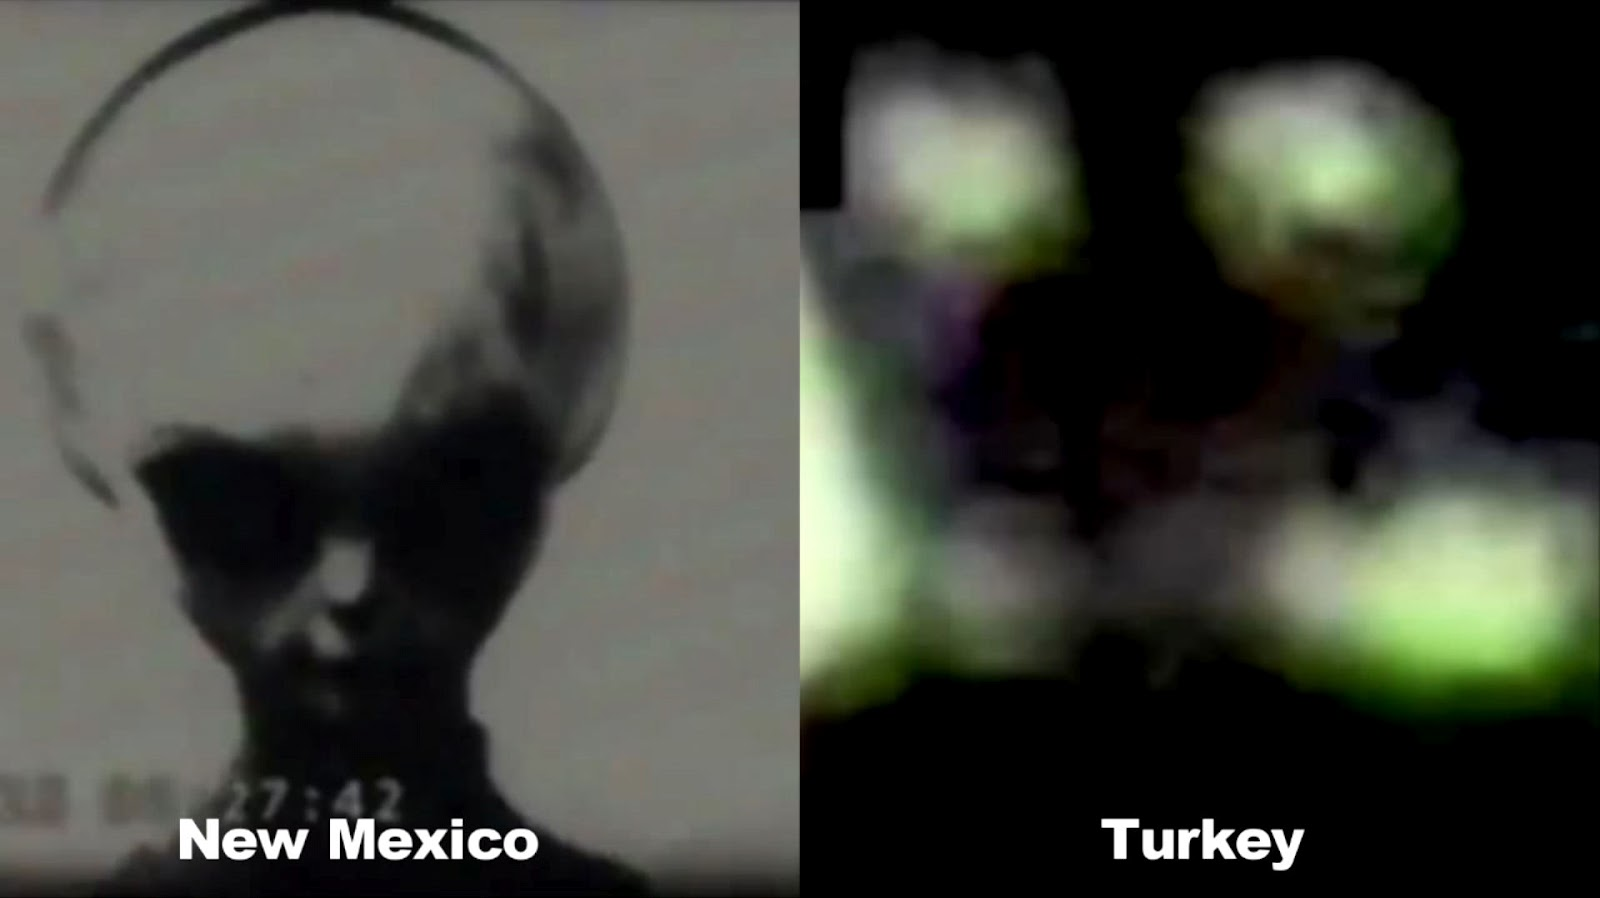 extraterrestre turquie